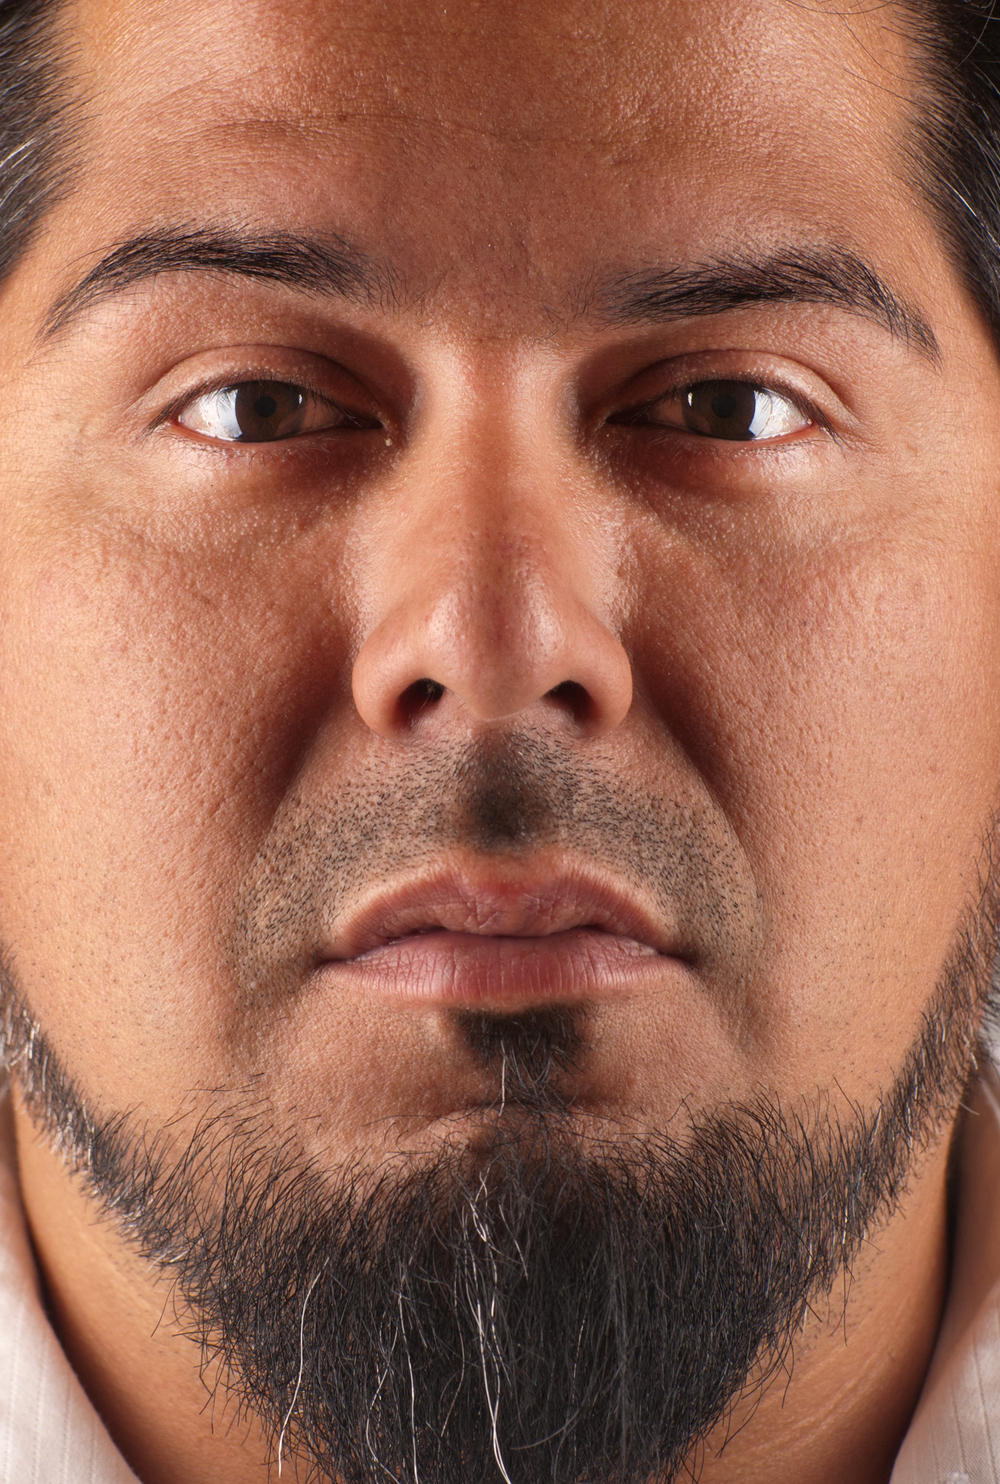 Self Portrait as Raul Baltazar